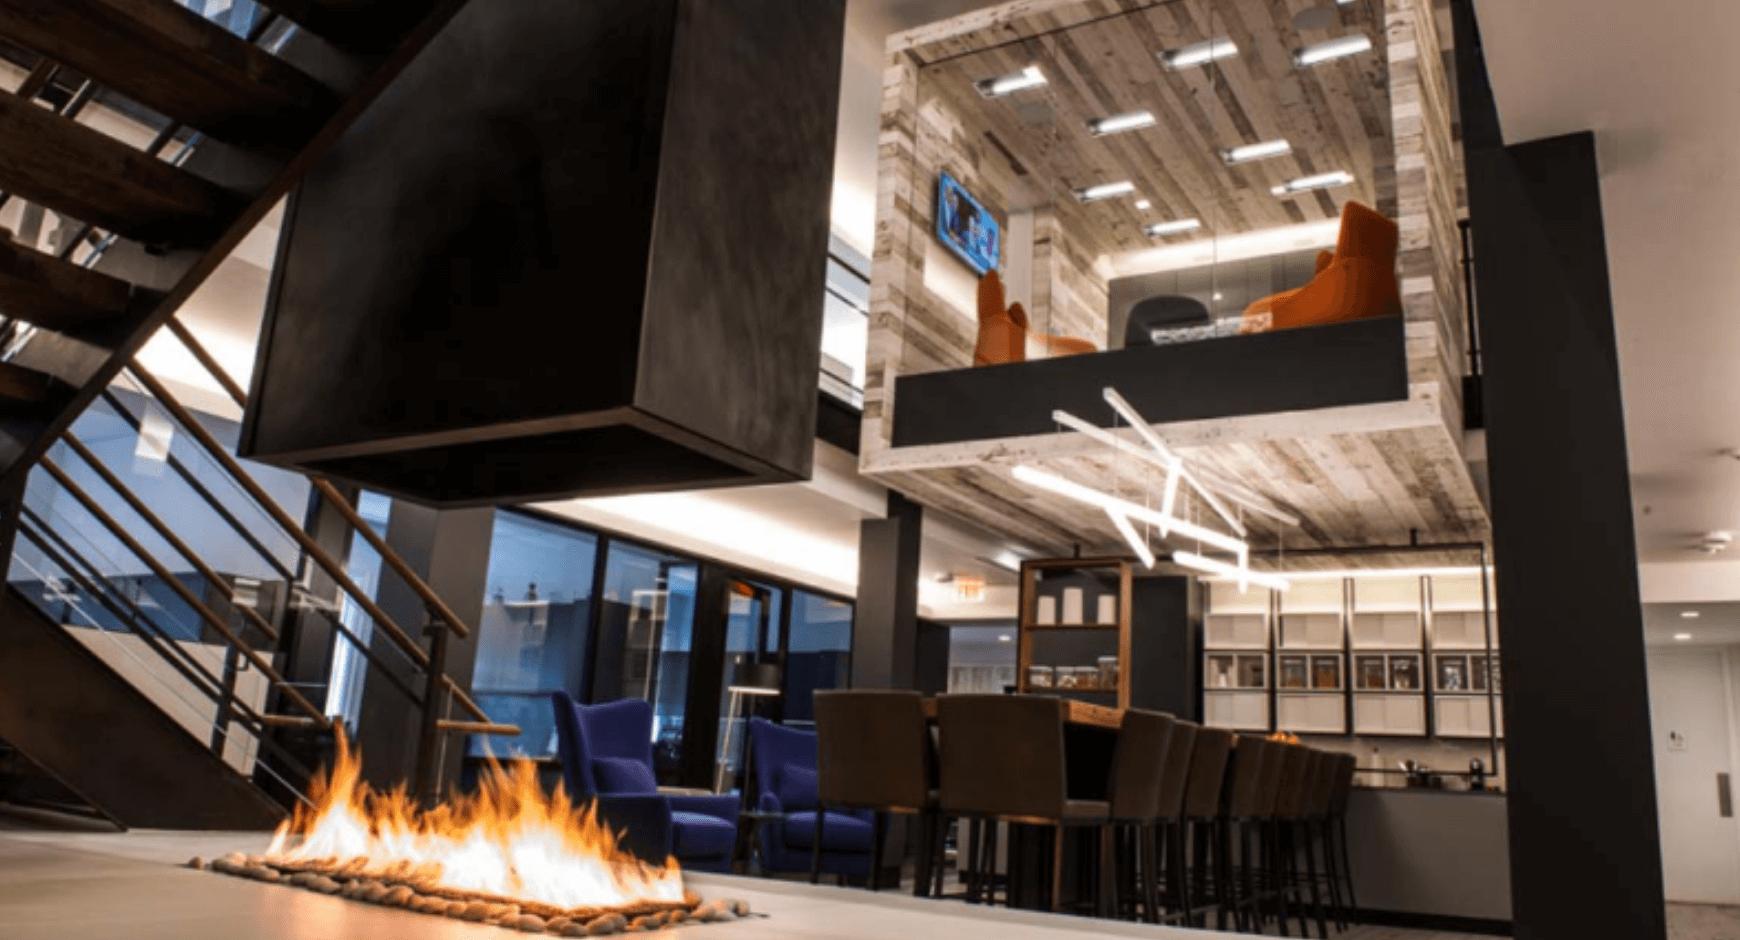 Reconfigured hotel lobby design